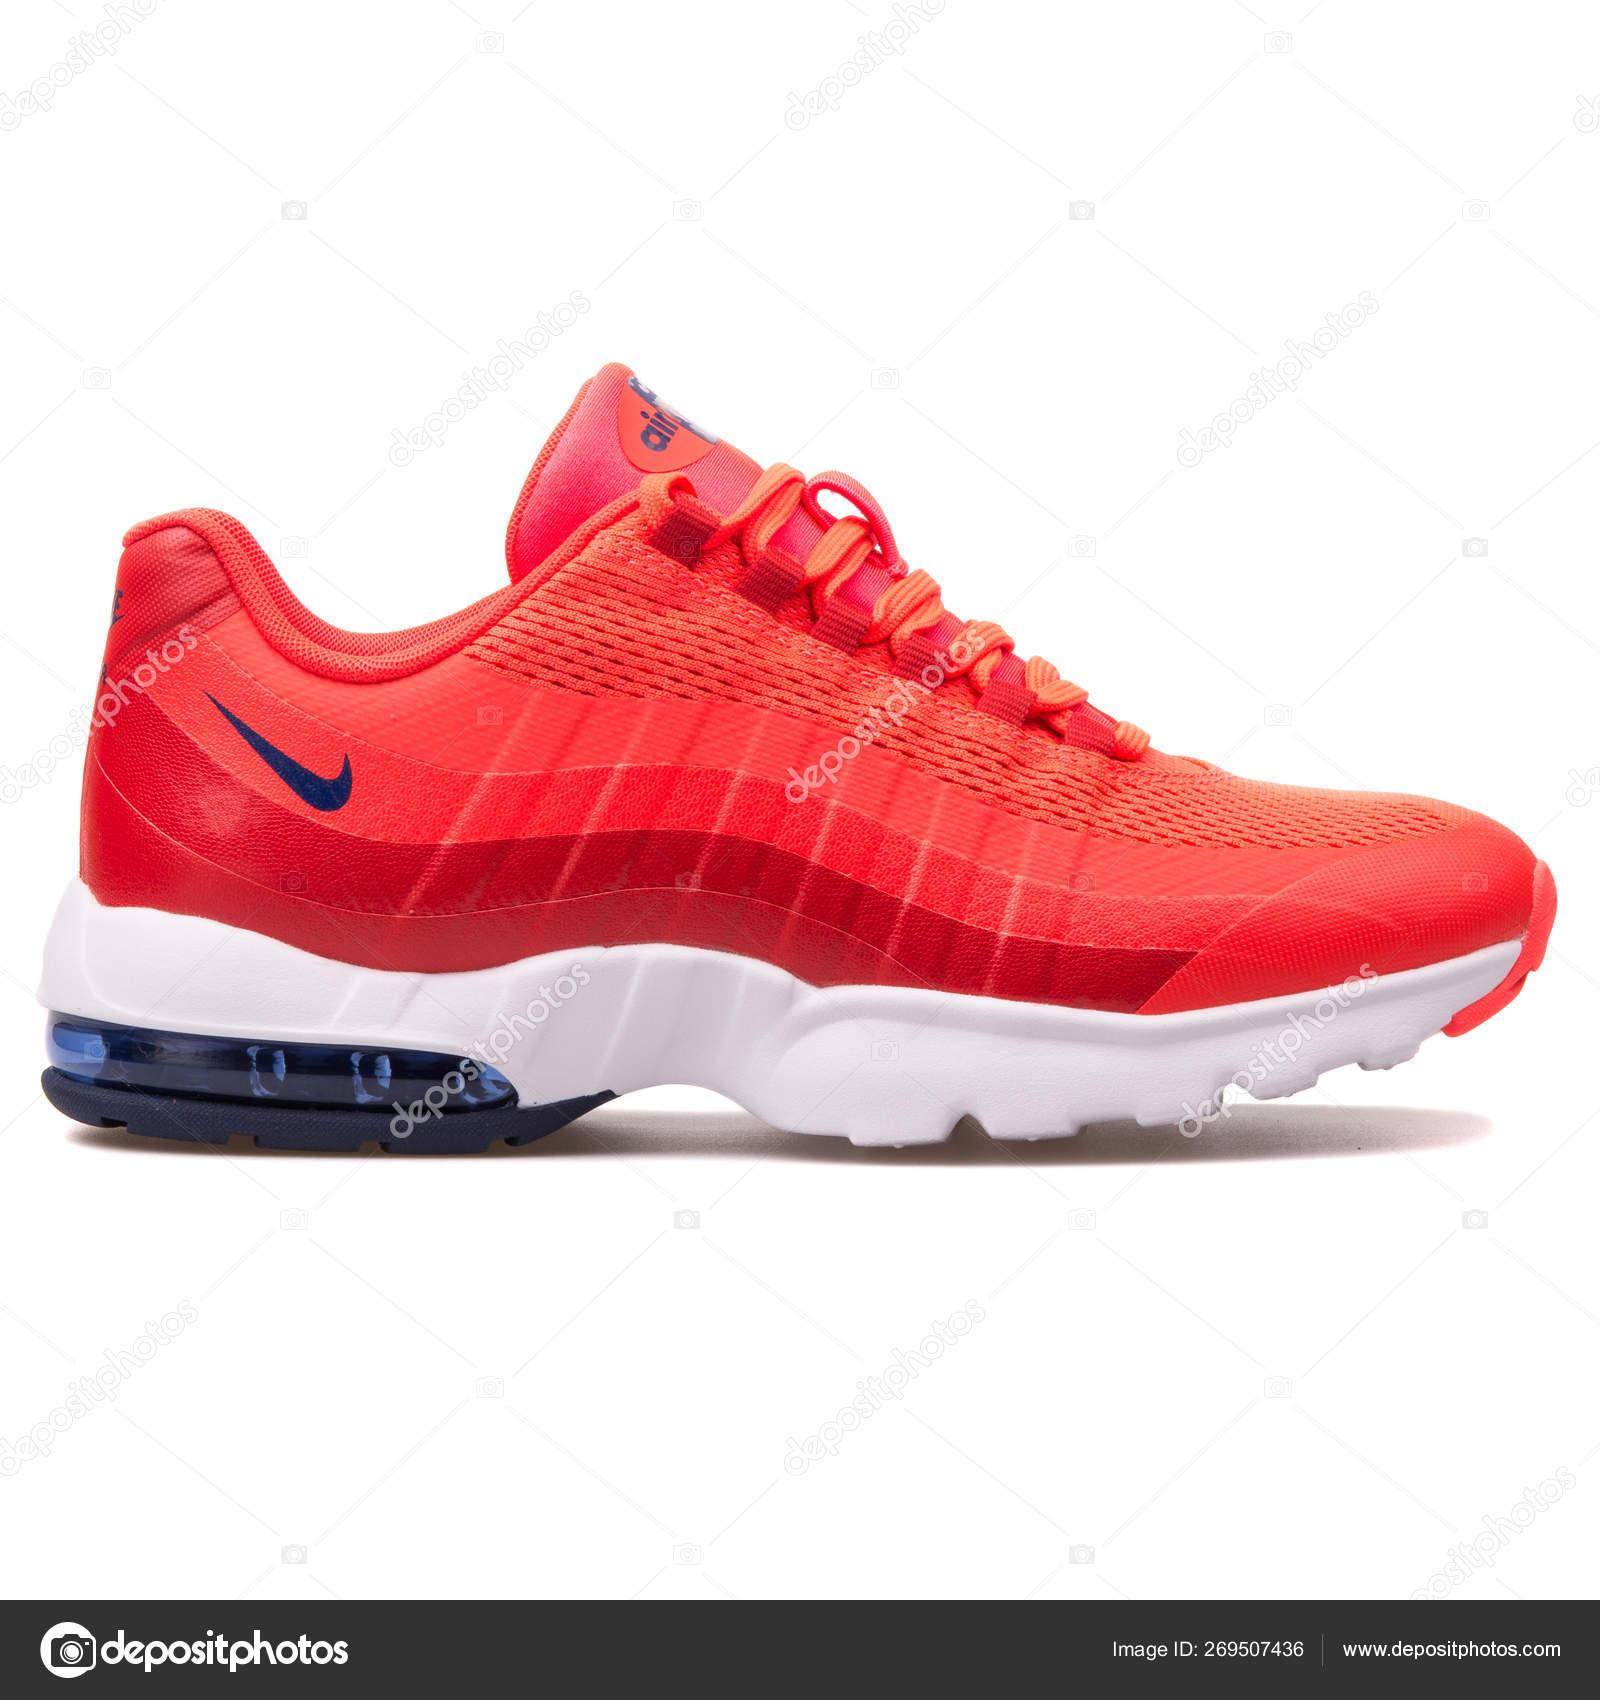 6c0d099b Nike Air Max 95 Ultra crimson sneaker – Stock Editorial Photo ...